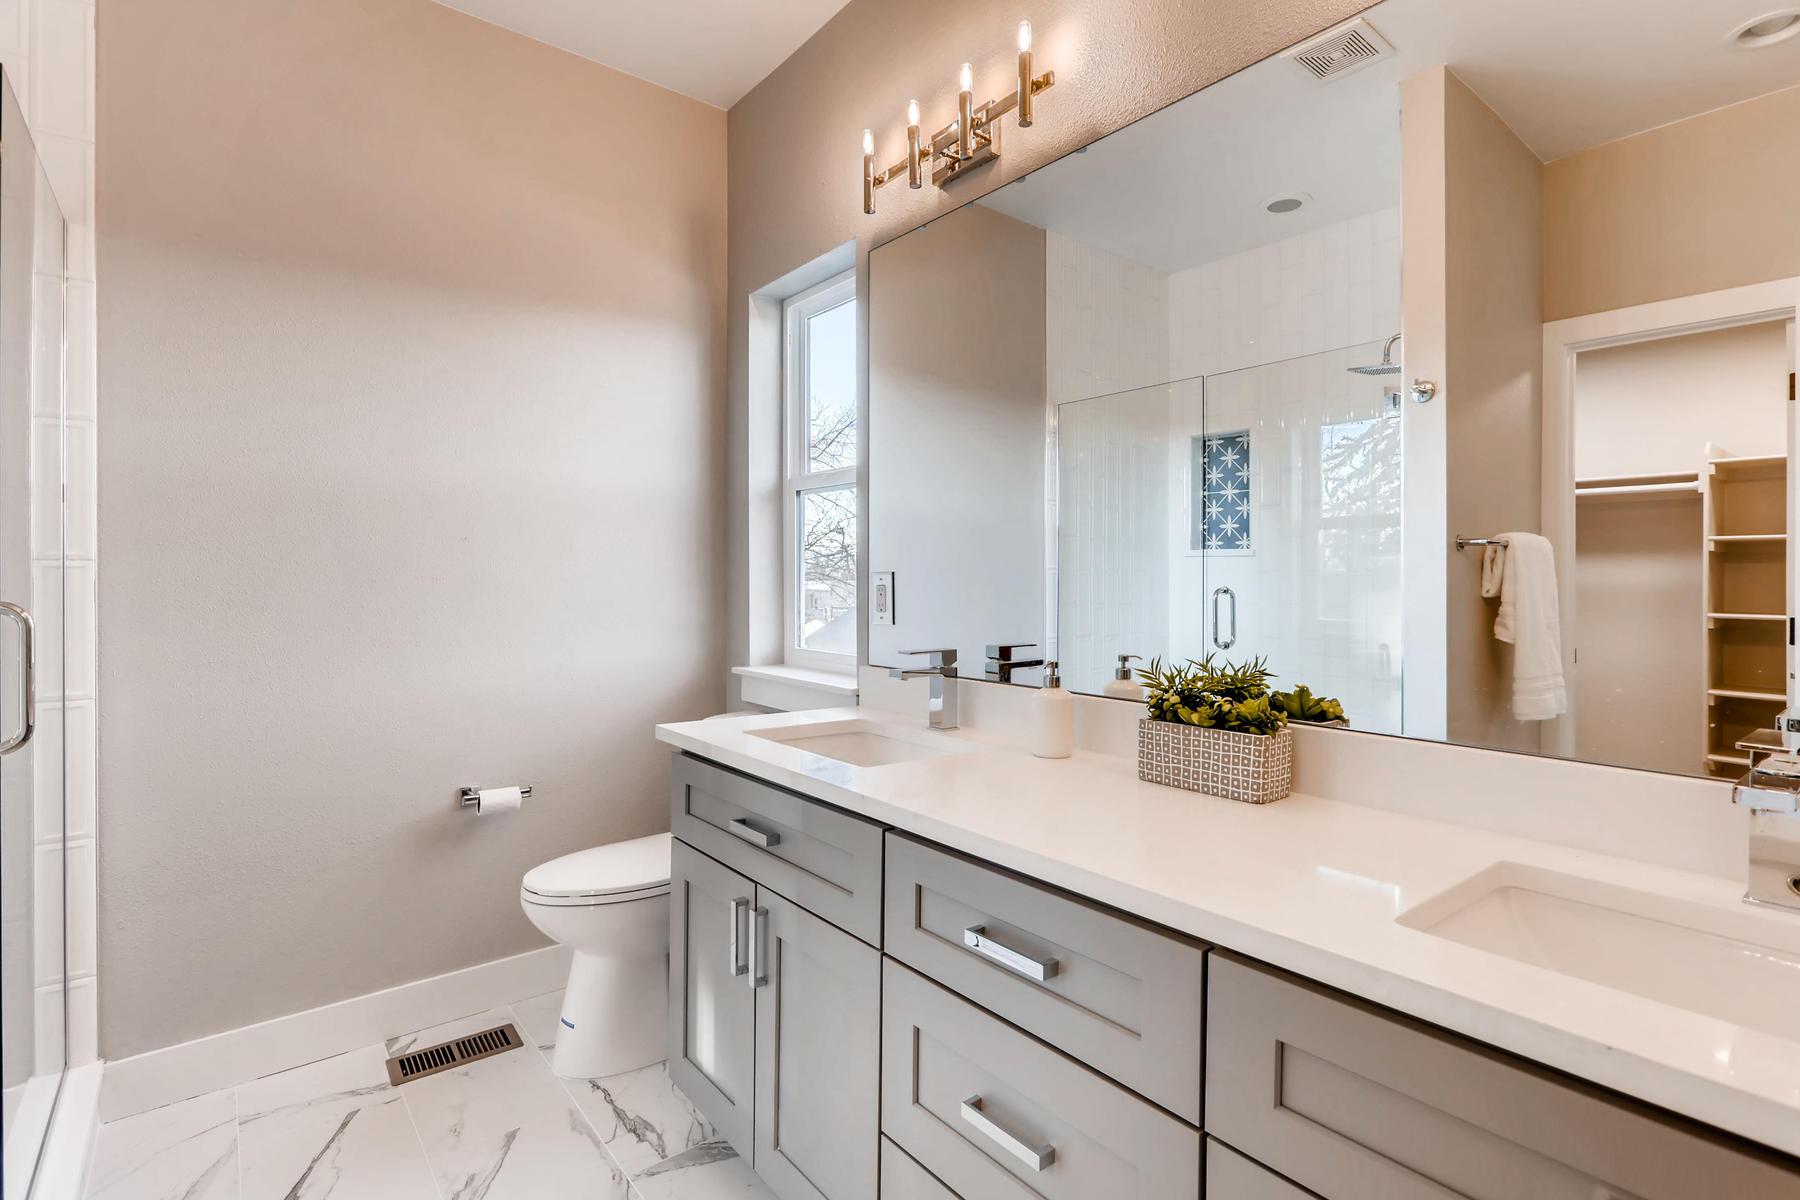 3105 S Cherokee St Englewood-020-16-2nd Floor Master Bathroom-MLS_Size.jpg